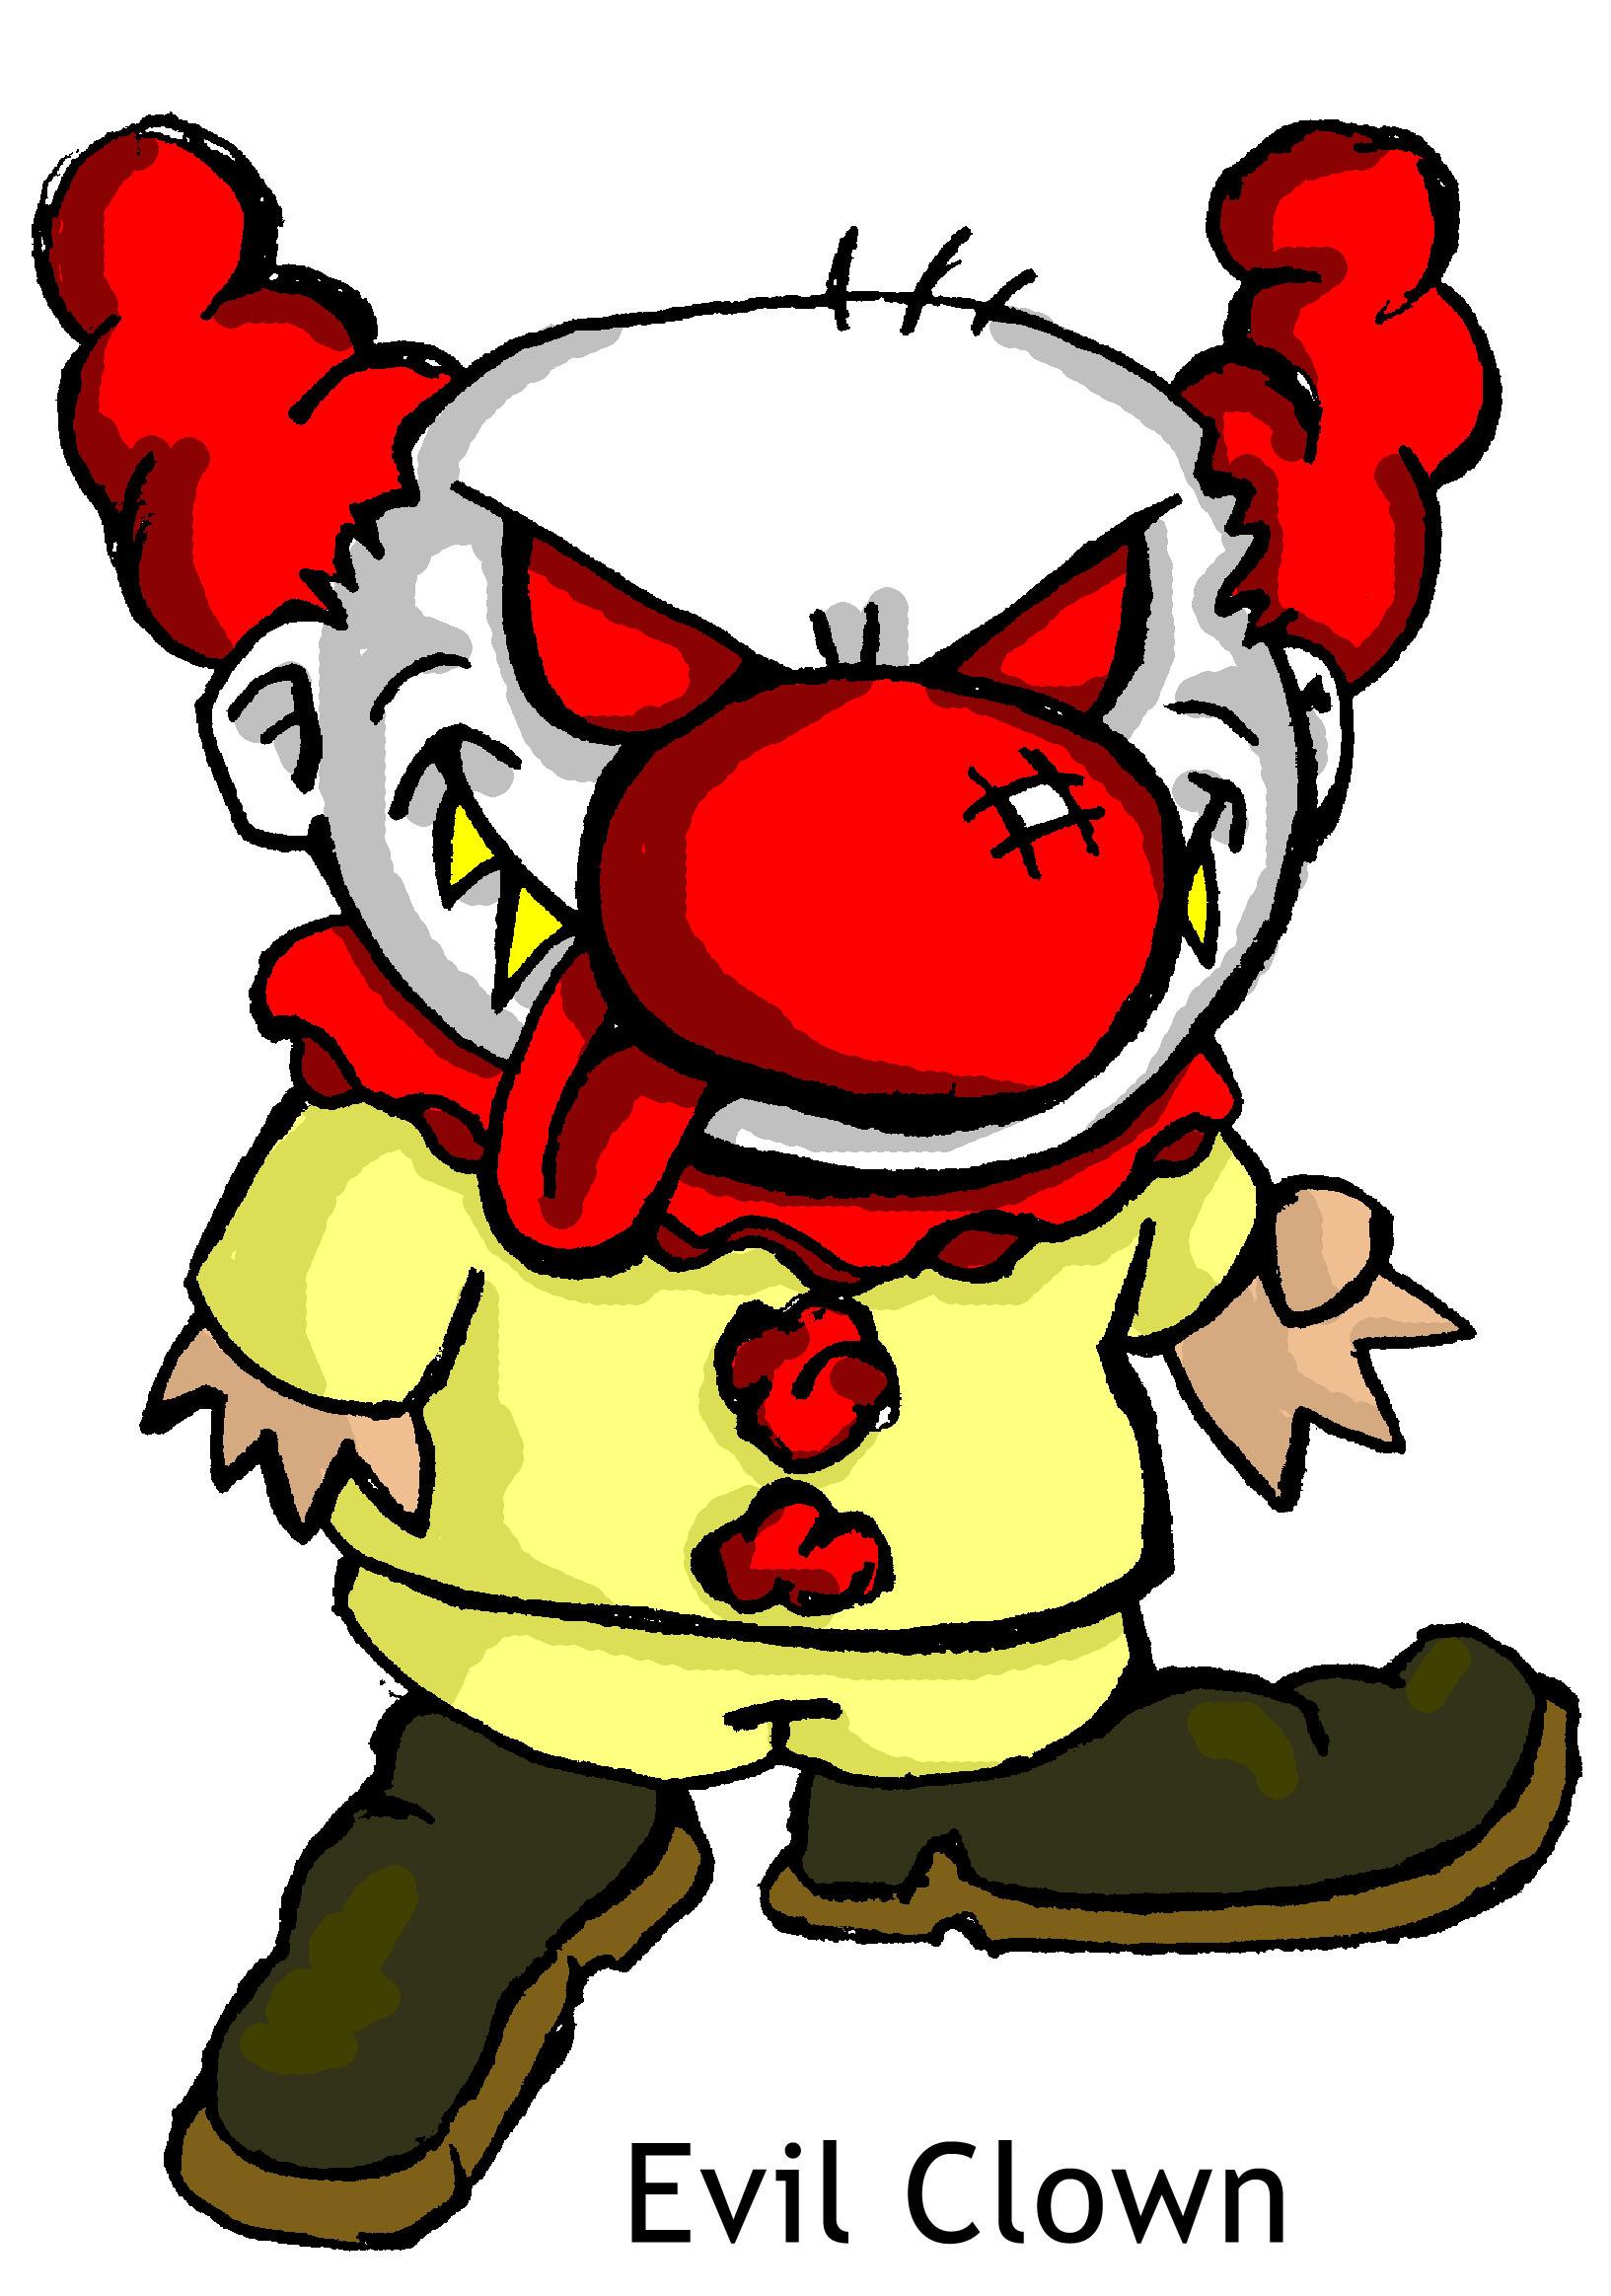 Free Evil Clown Png, Download Free Clip Art, Free Clip Art.